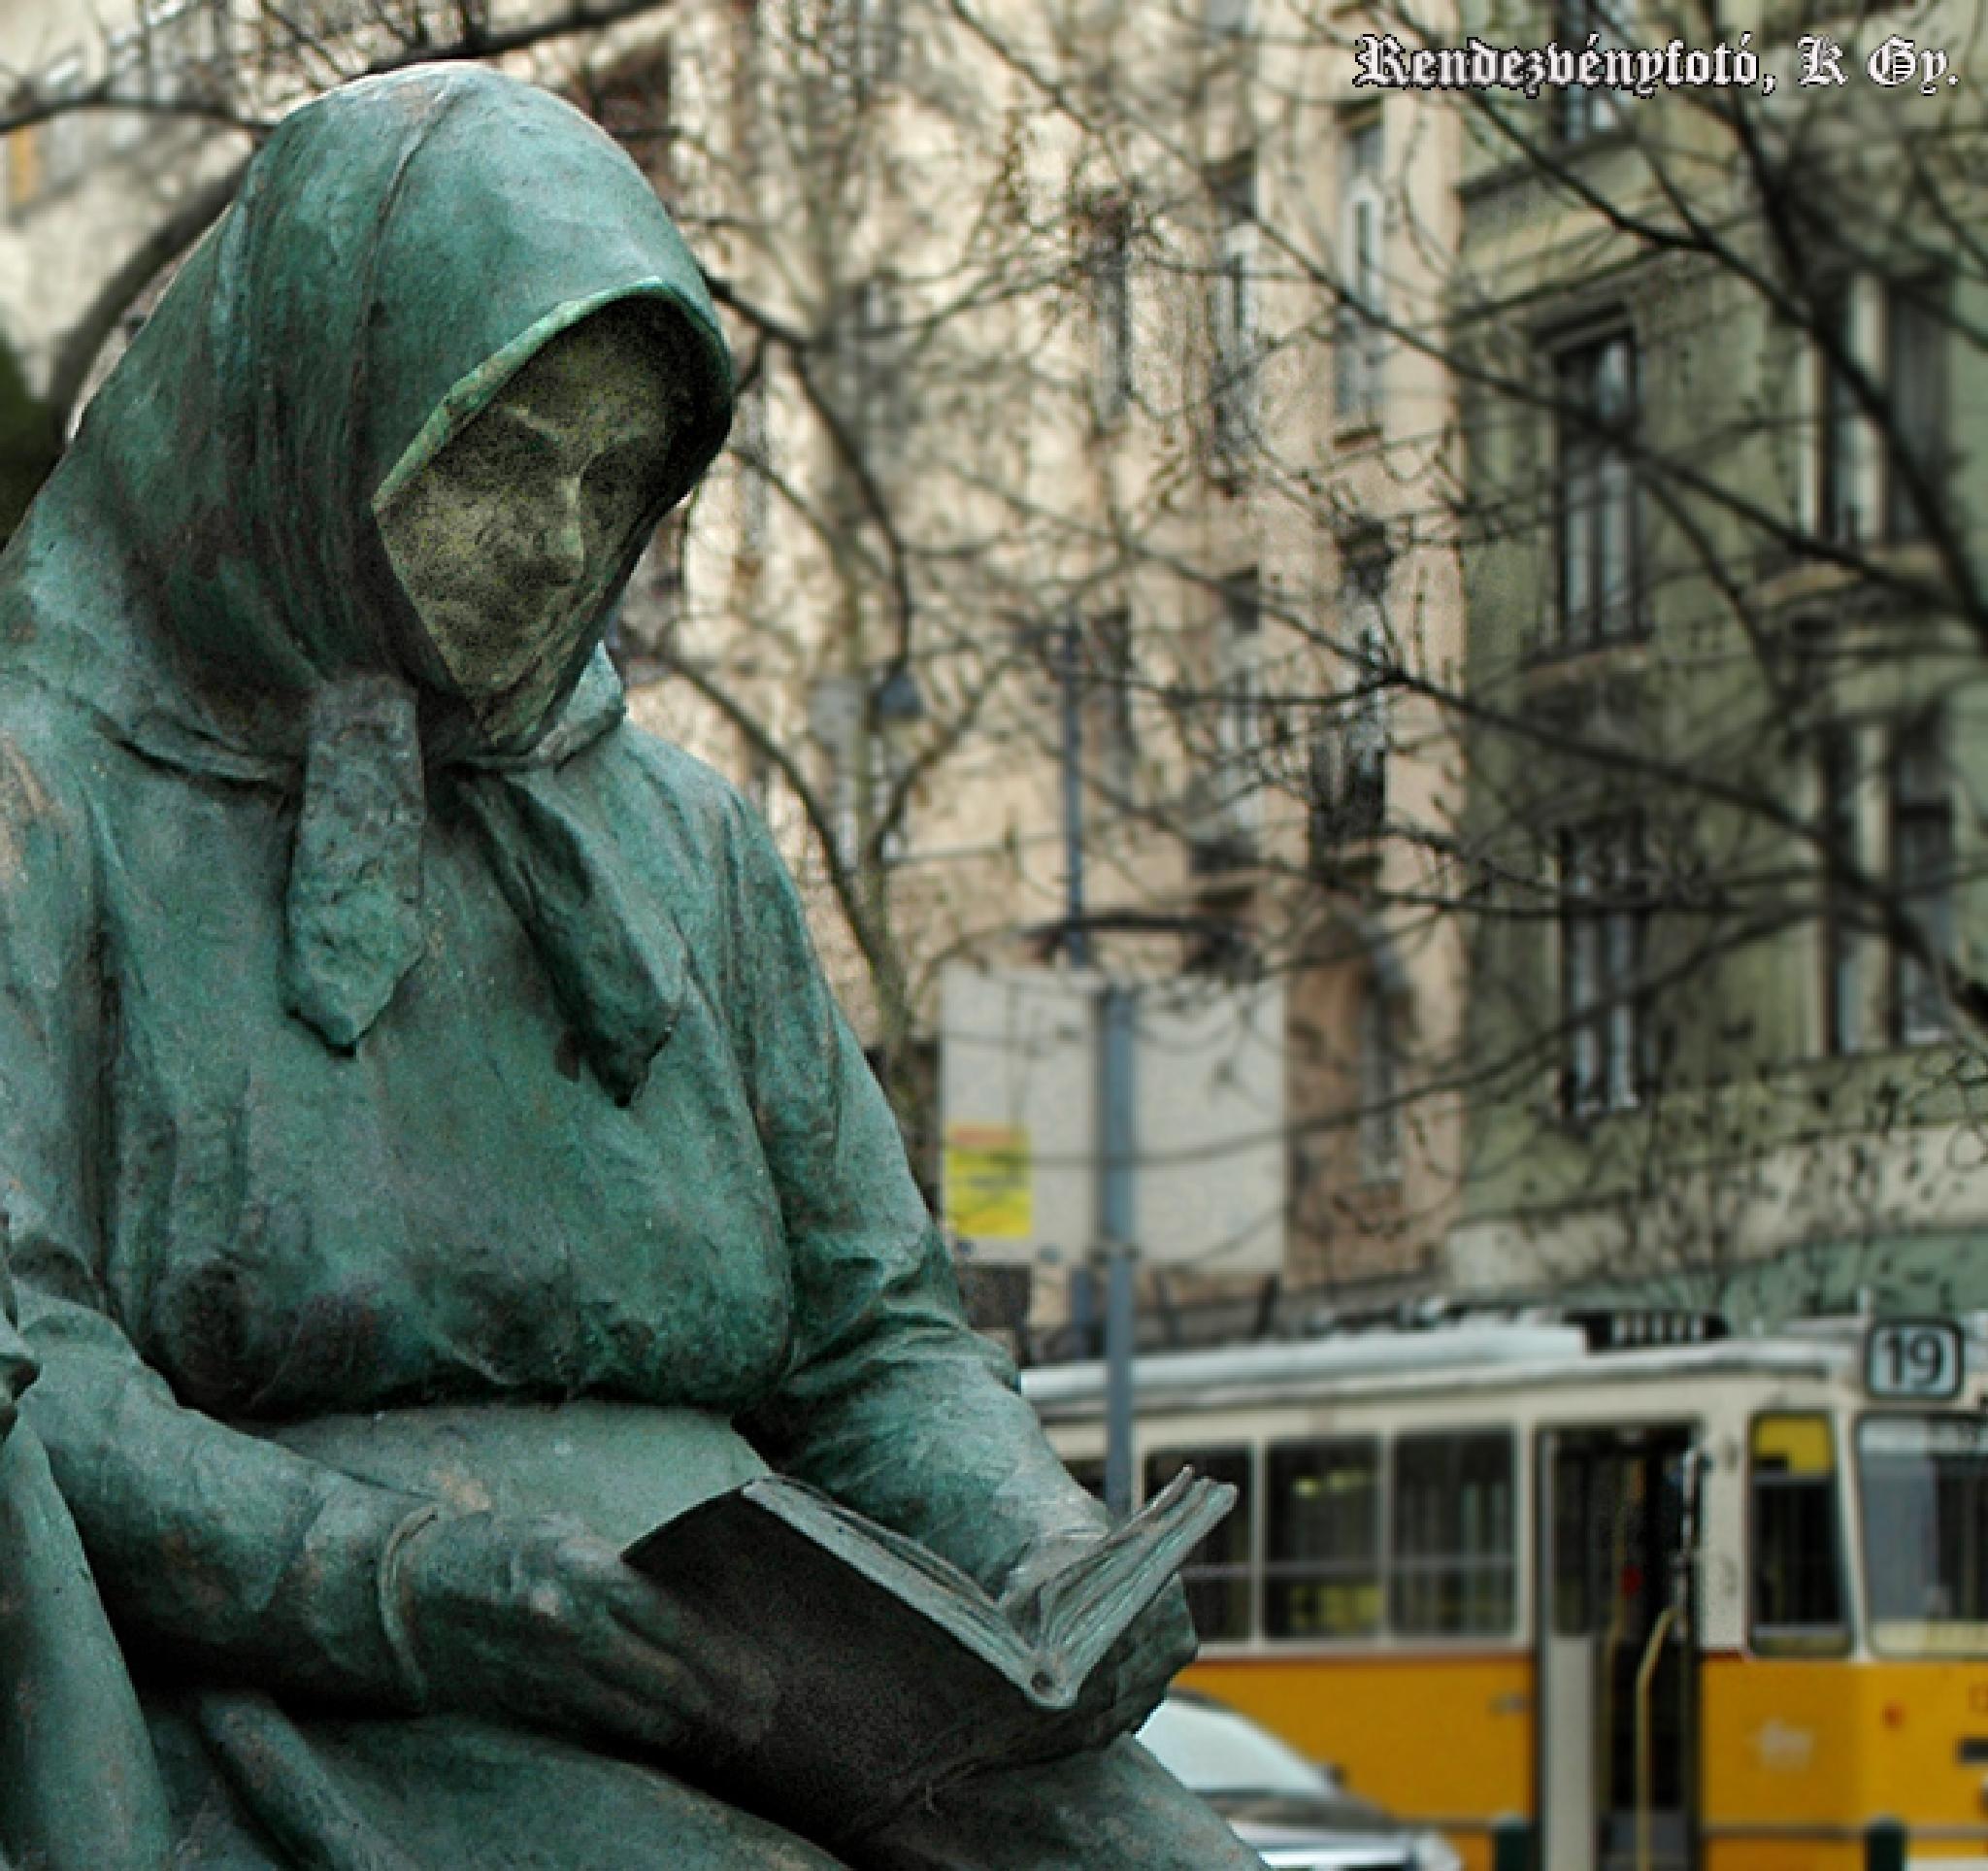 Budapest, Gárdonyi Géza detail Sculpture by Event photo- video